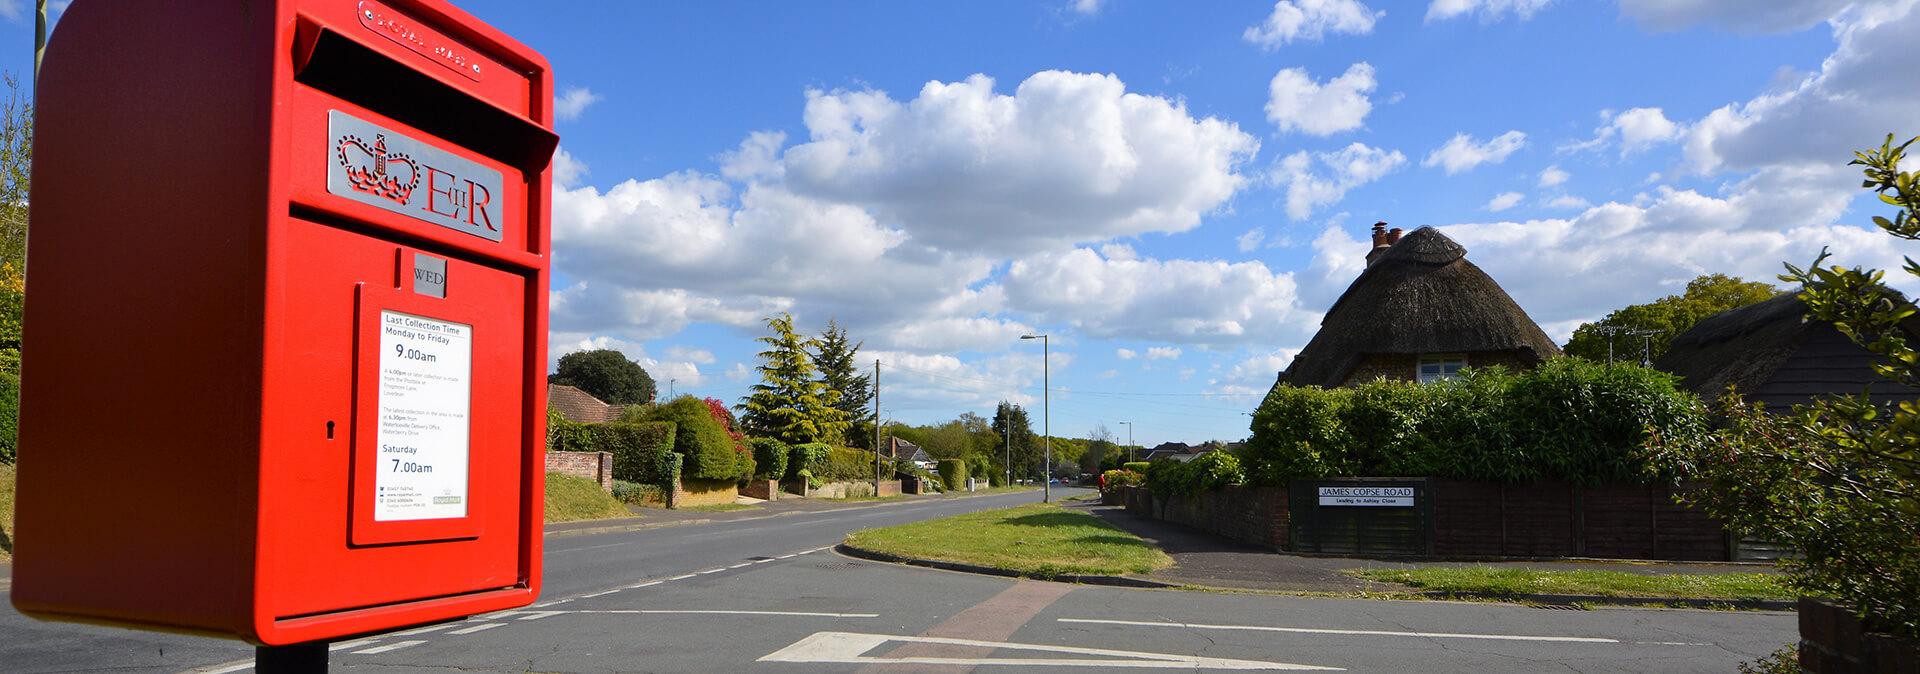 James Copse Road